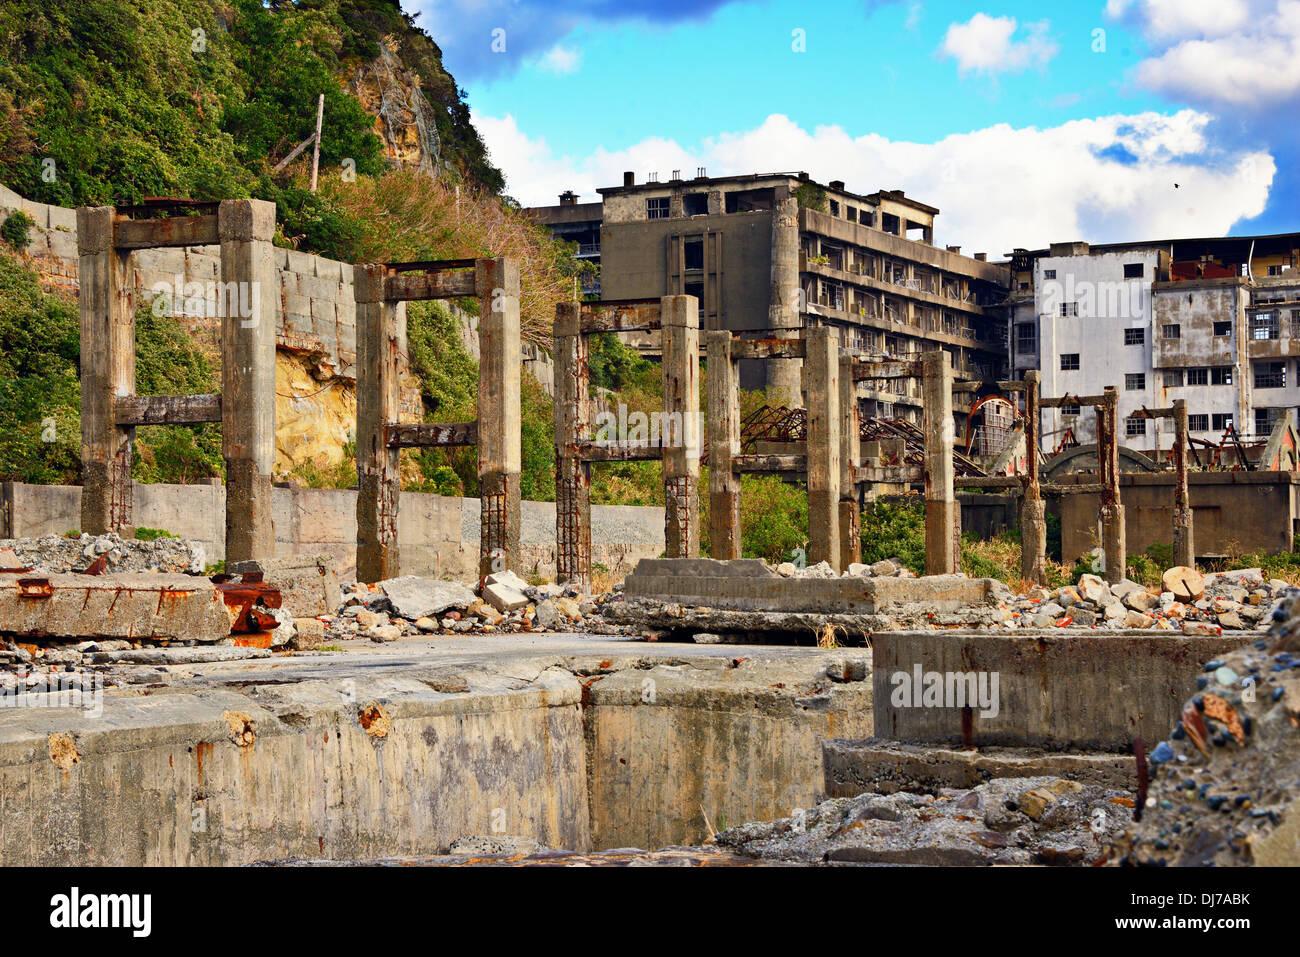 Die verlassenen industriellen Insel von Gunkanjima, Nagasaki, Japan. Stockbild